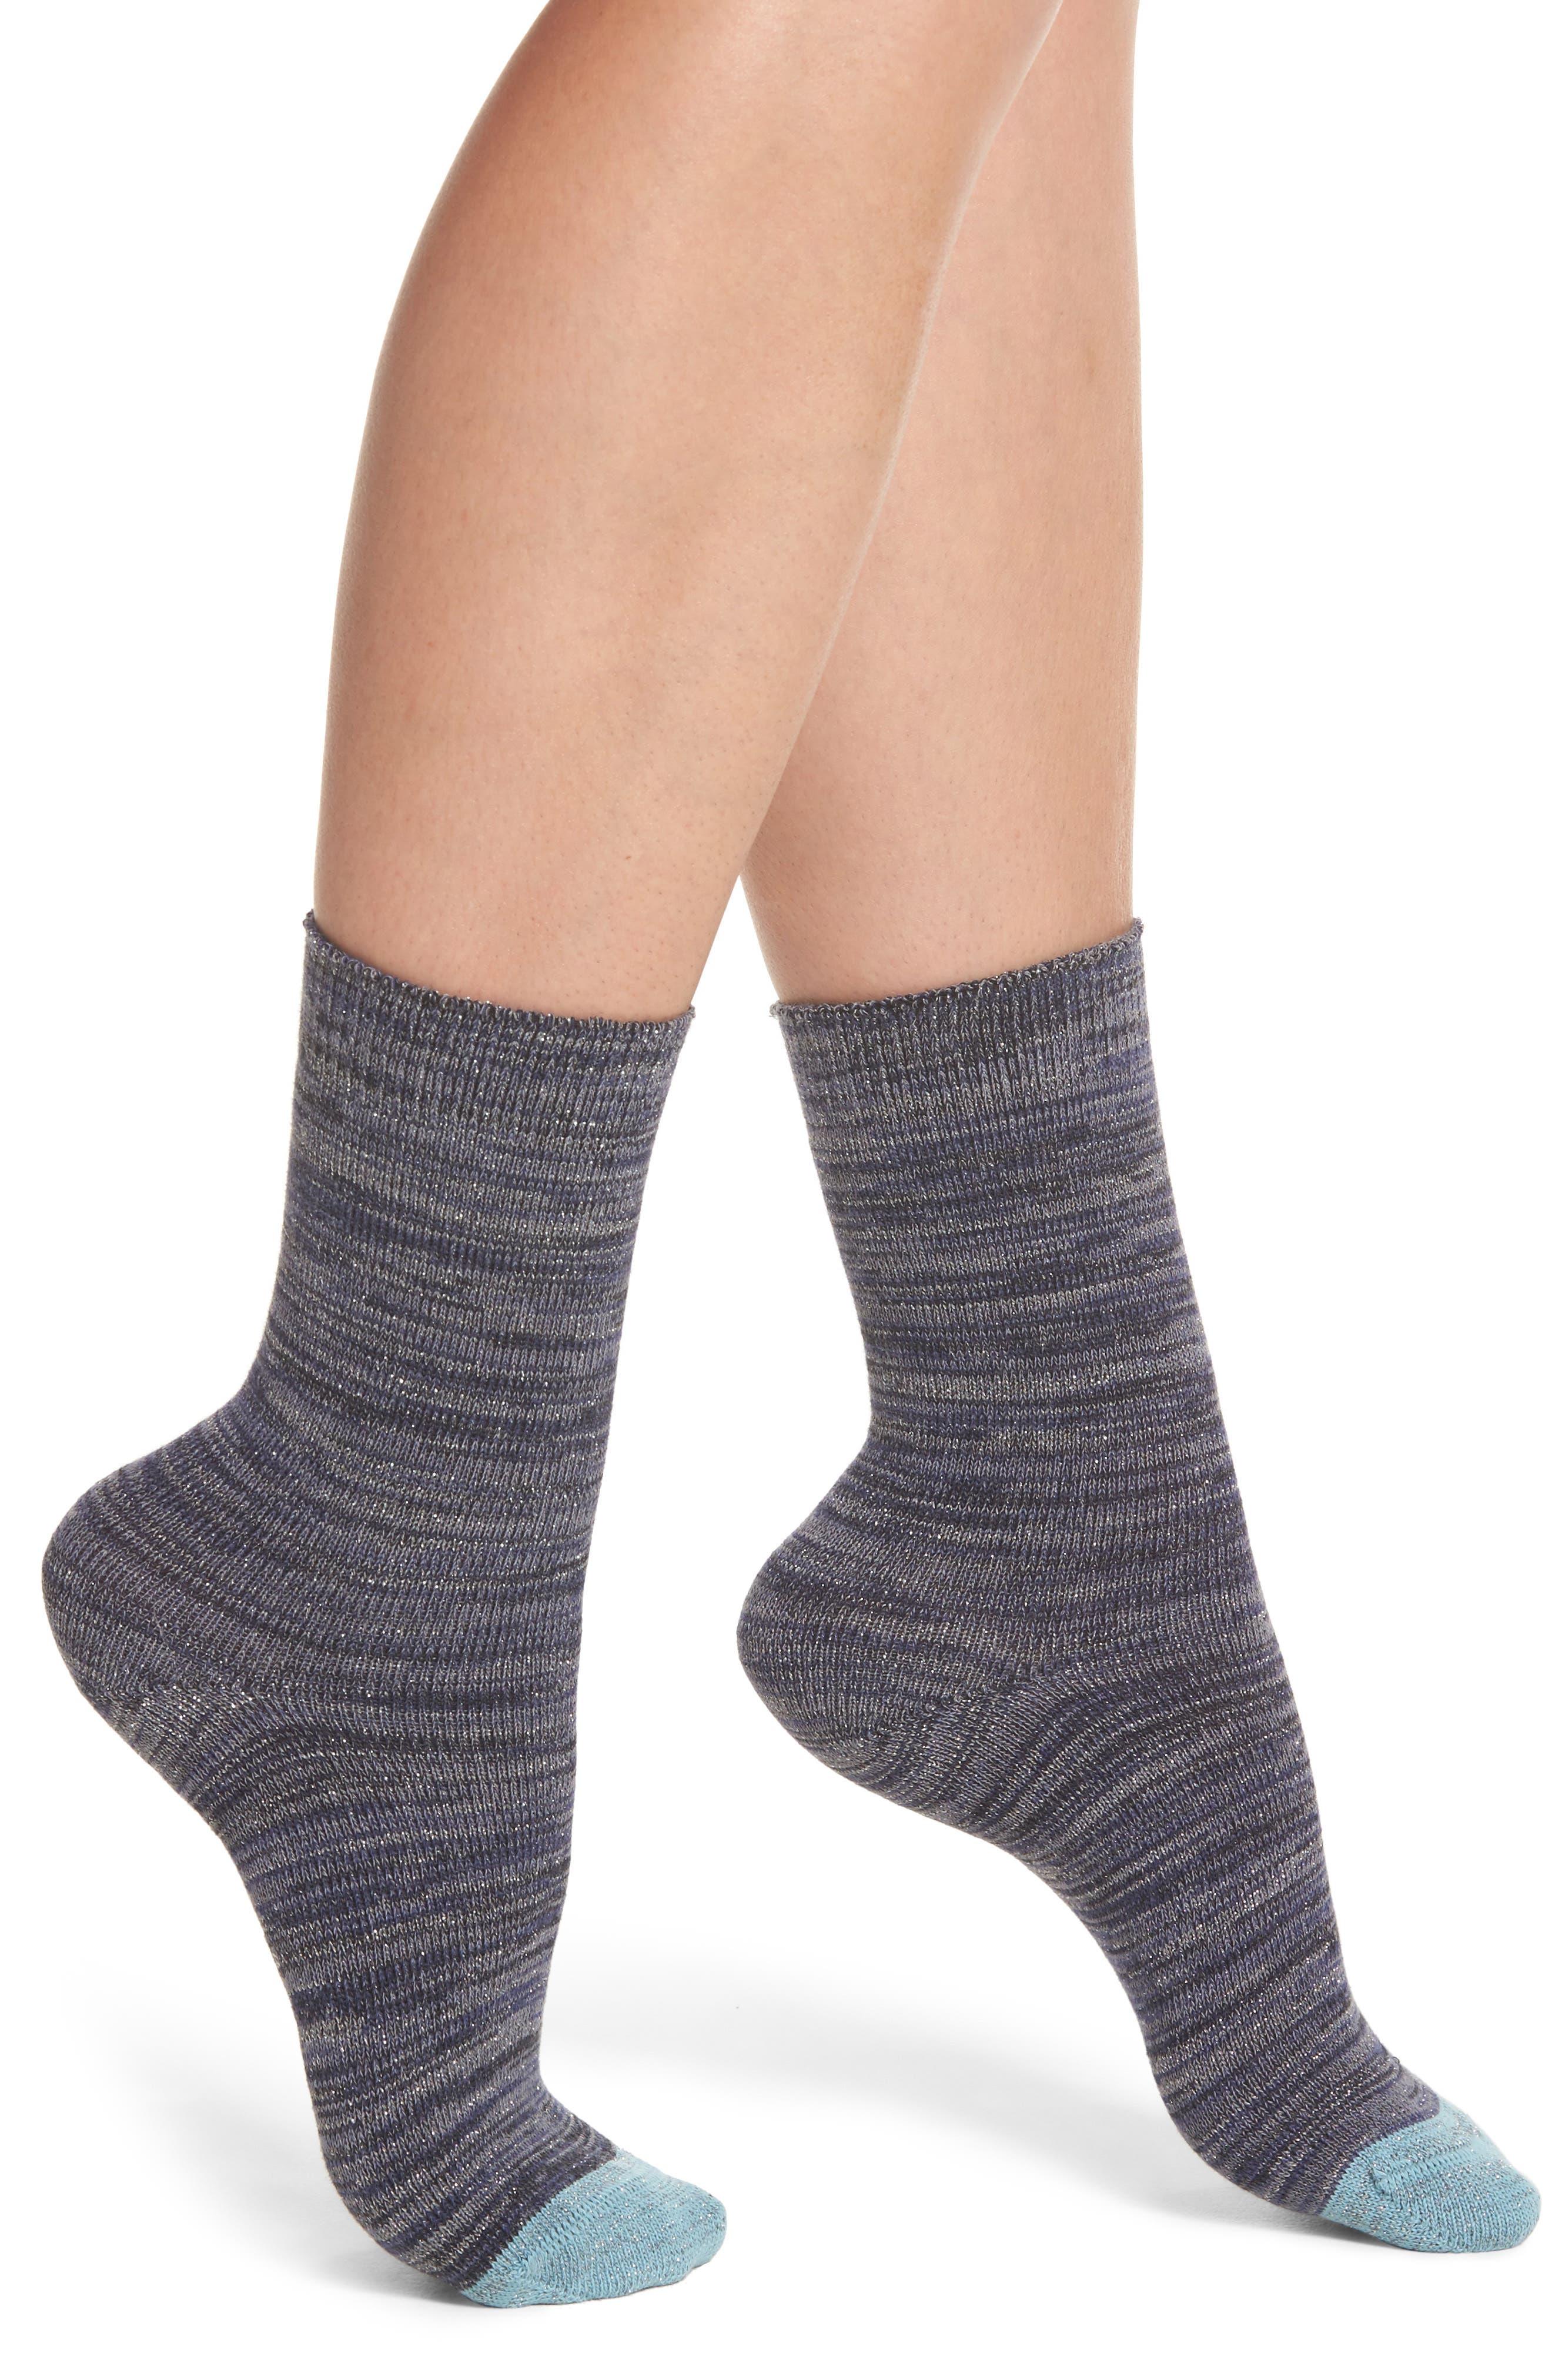 Emily Twinkletoes Crew Socks,                         Main,                         color, 400